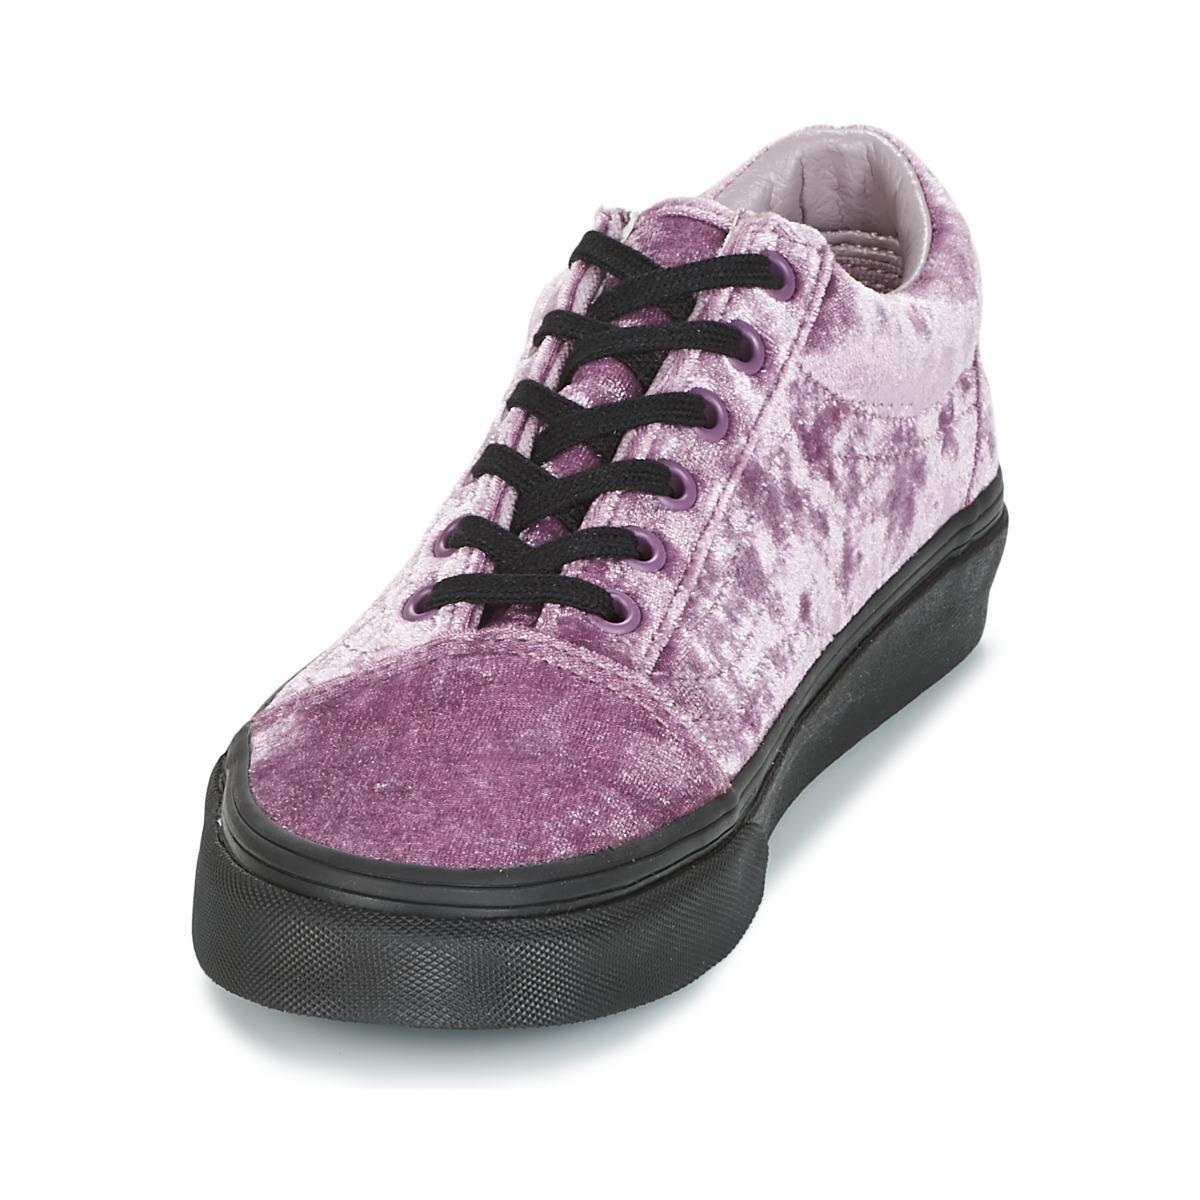 Vans Old Skool Women's Shoes (trainers) In Pink